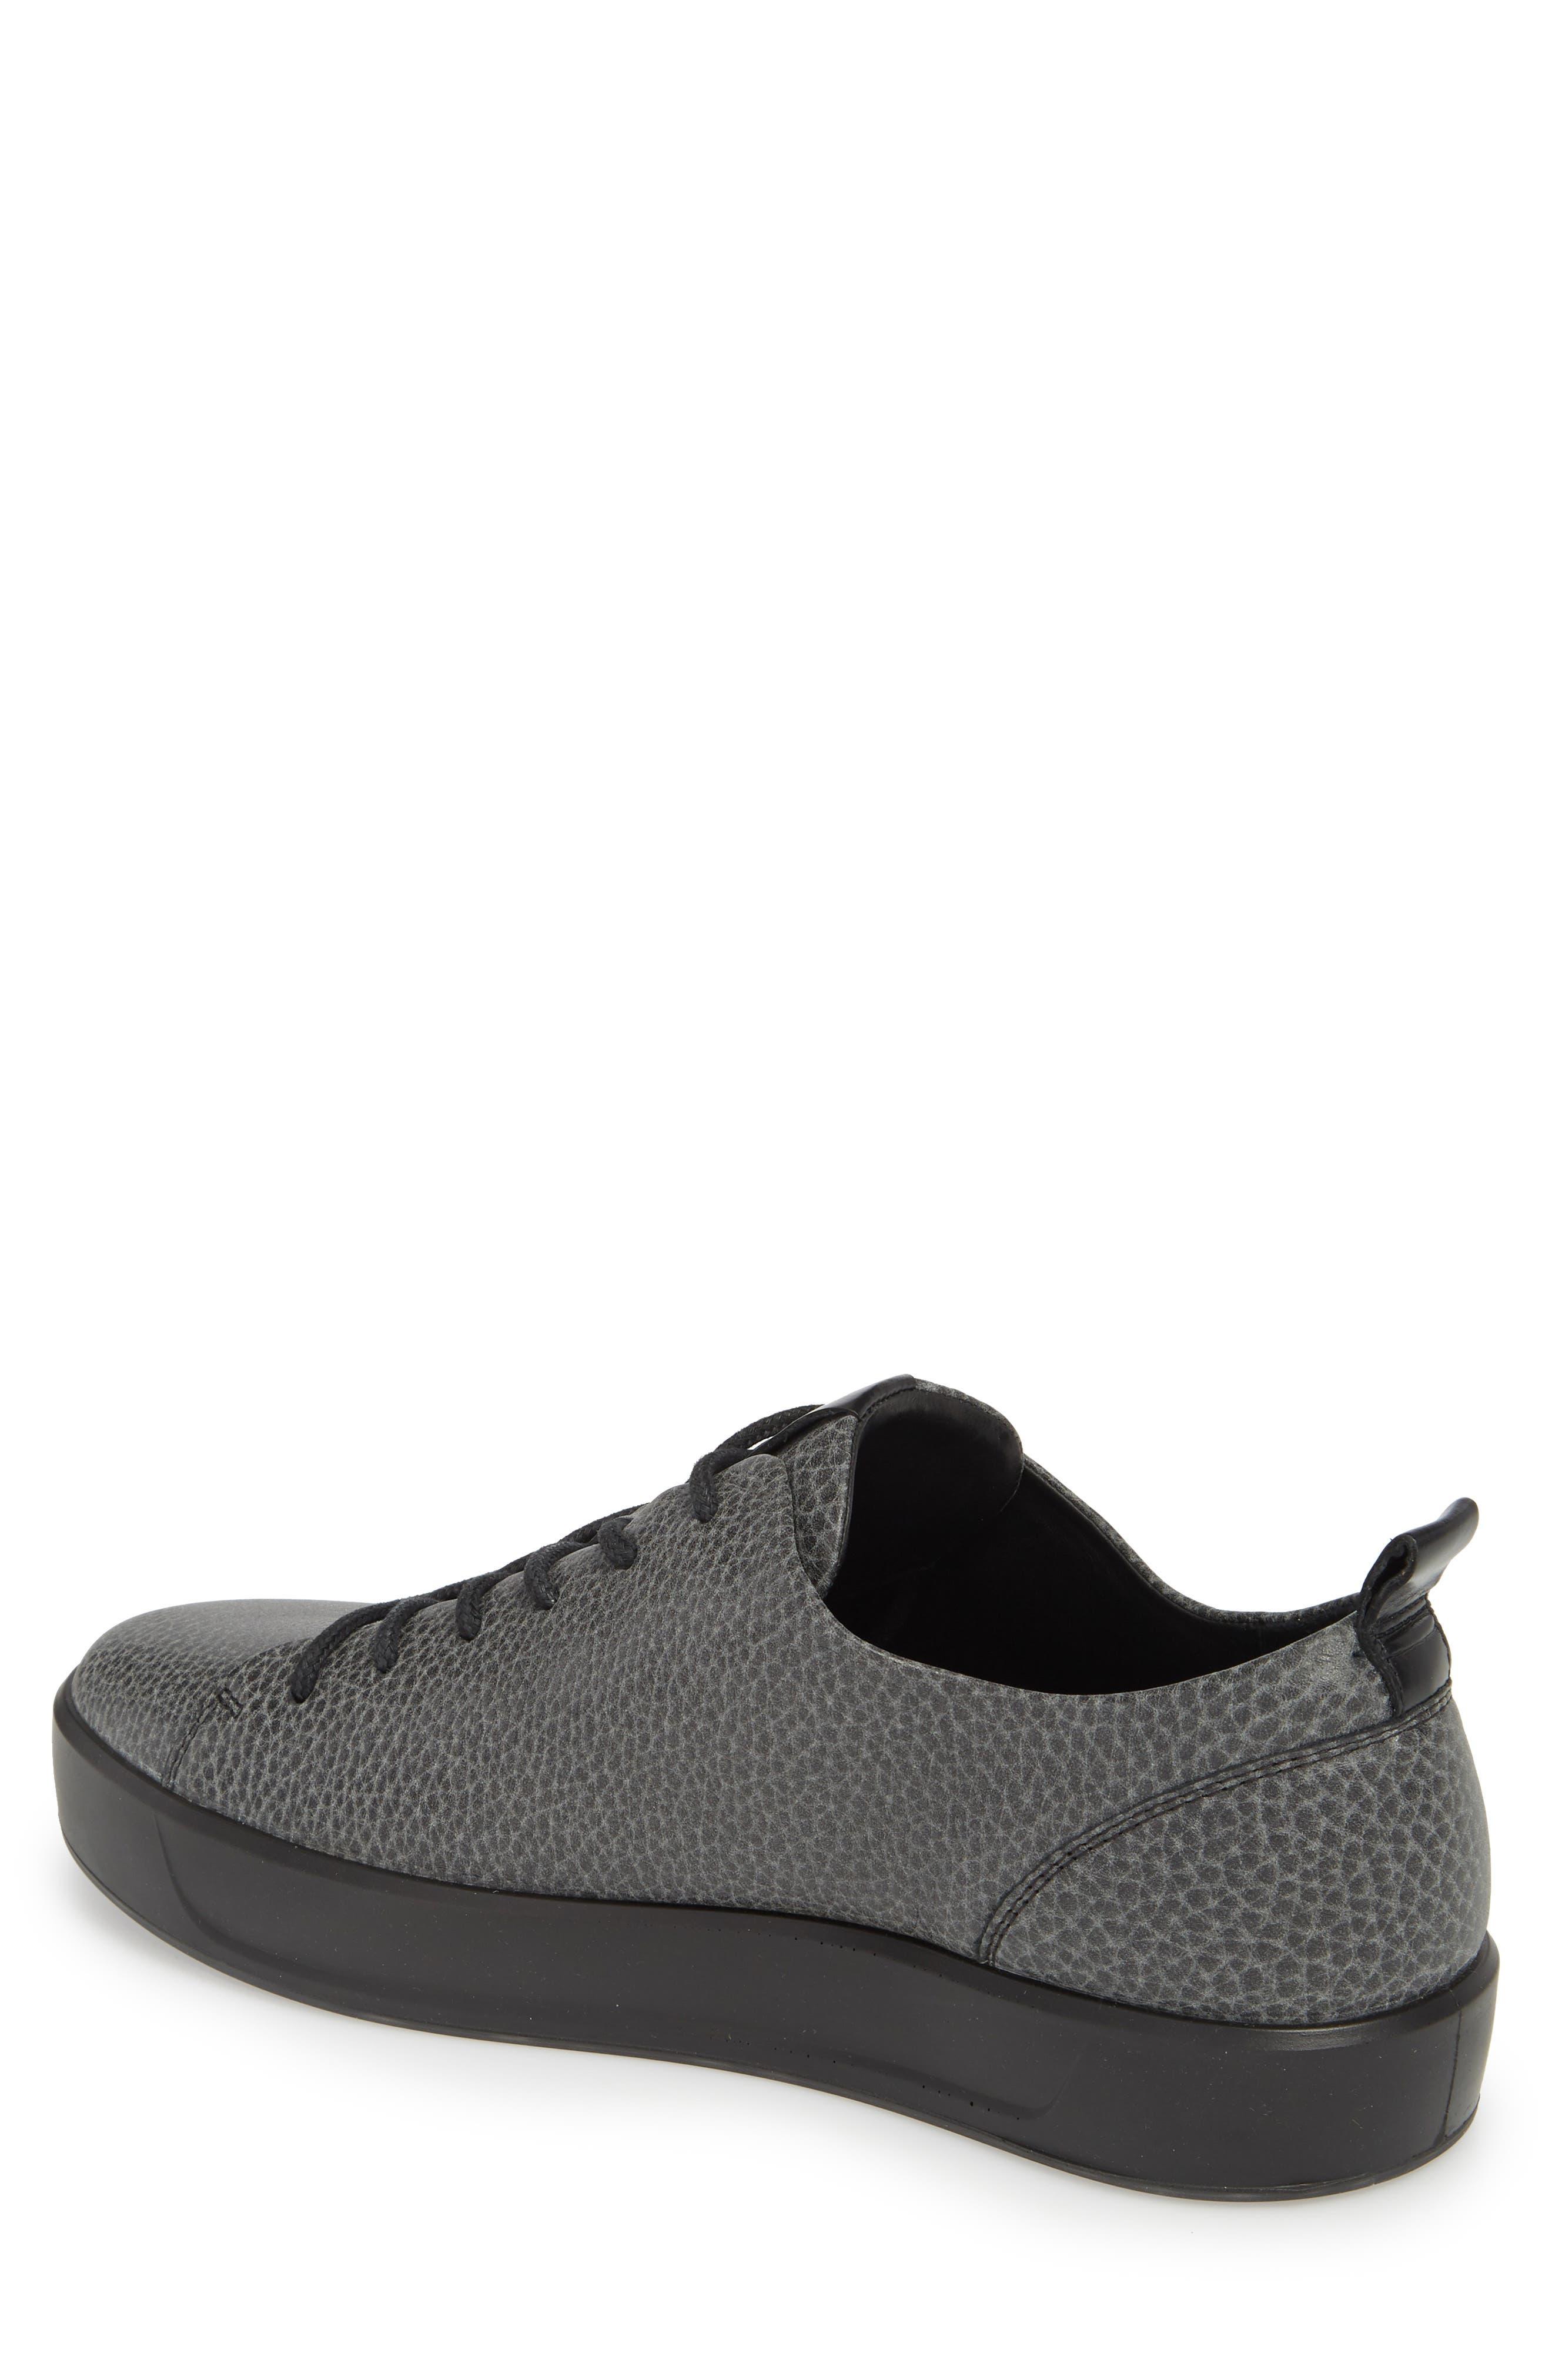 Soft 8 Tie II Low Top Sneaker,                             Alternate thumbnail 2, color,                             BLACK